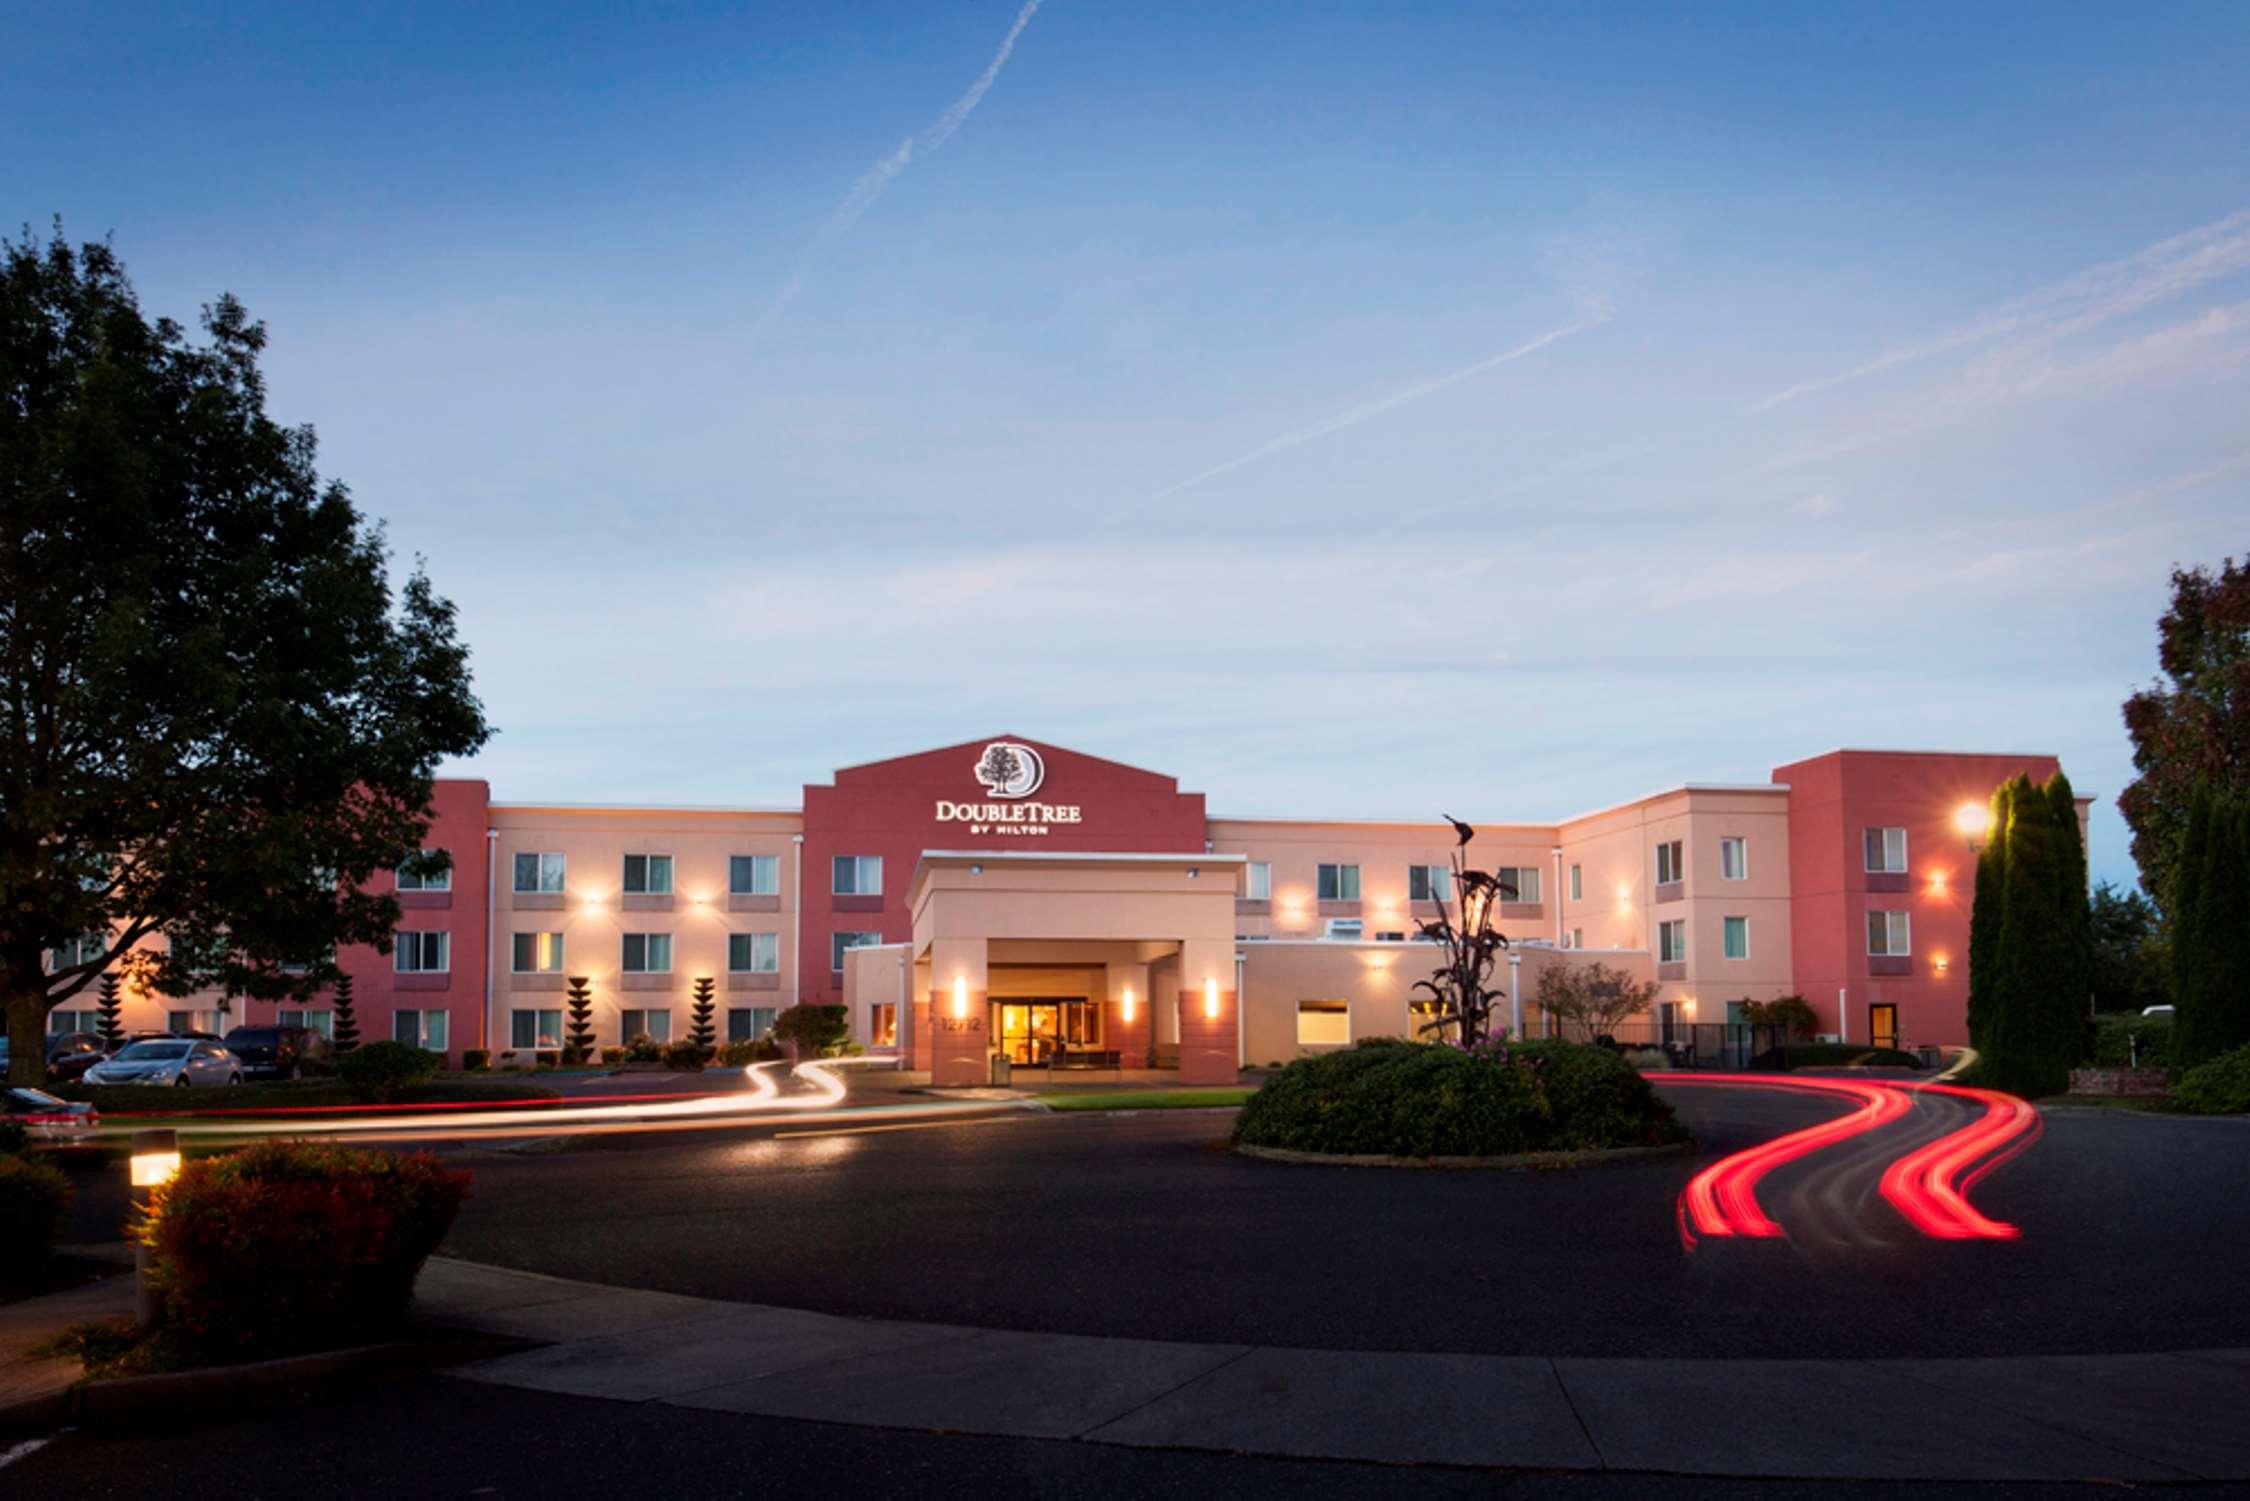 DoubleTree by Hilton Hotel Vancouver, Washington image 0